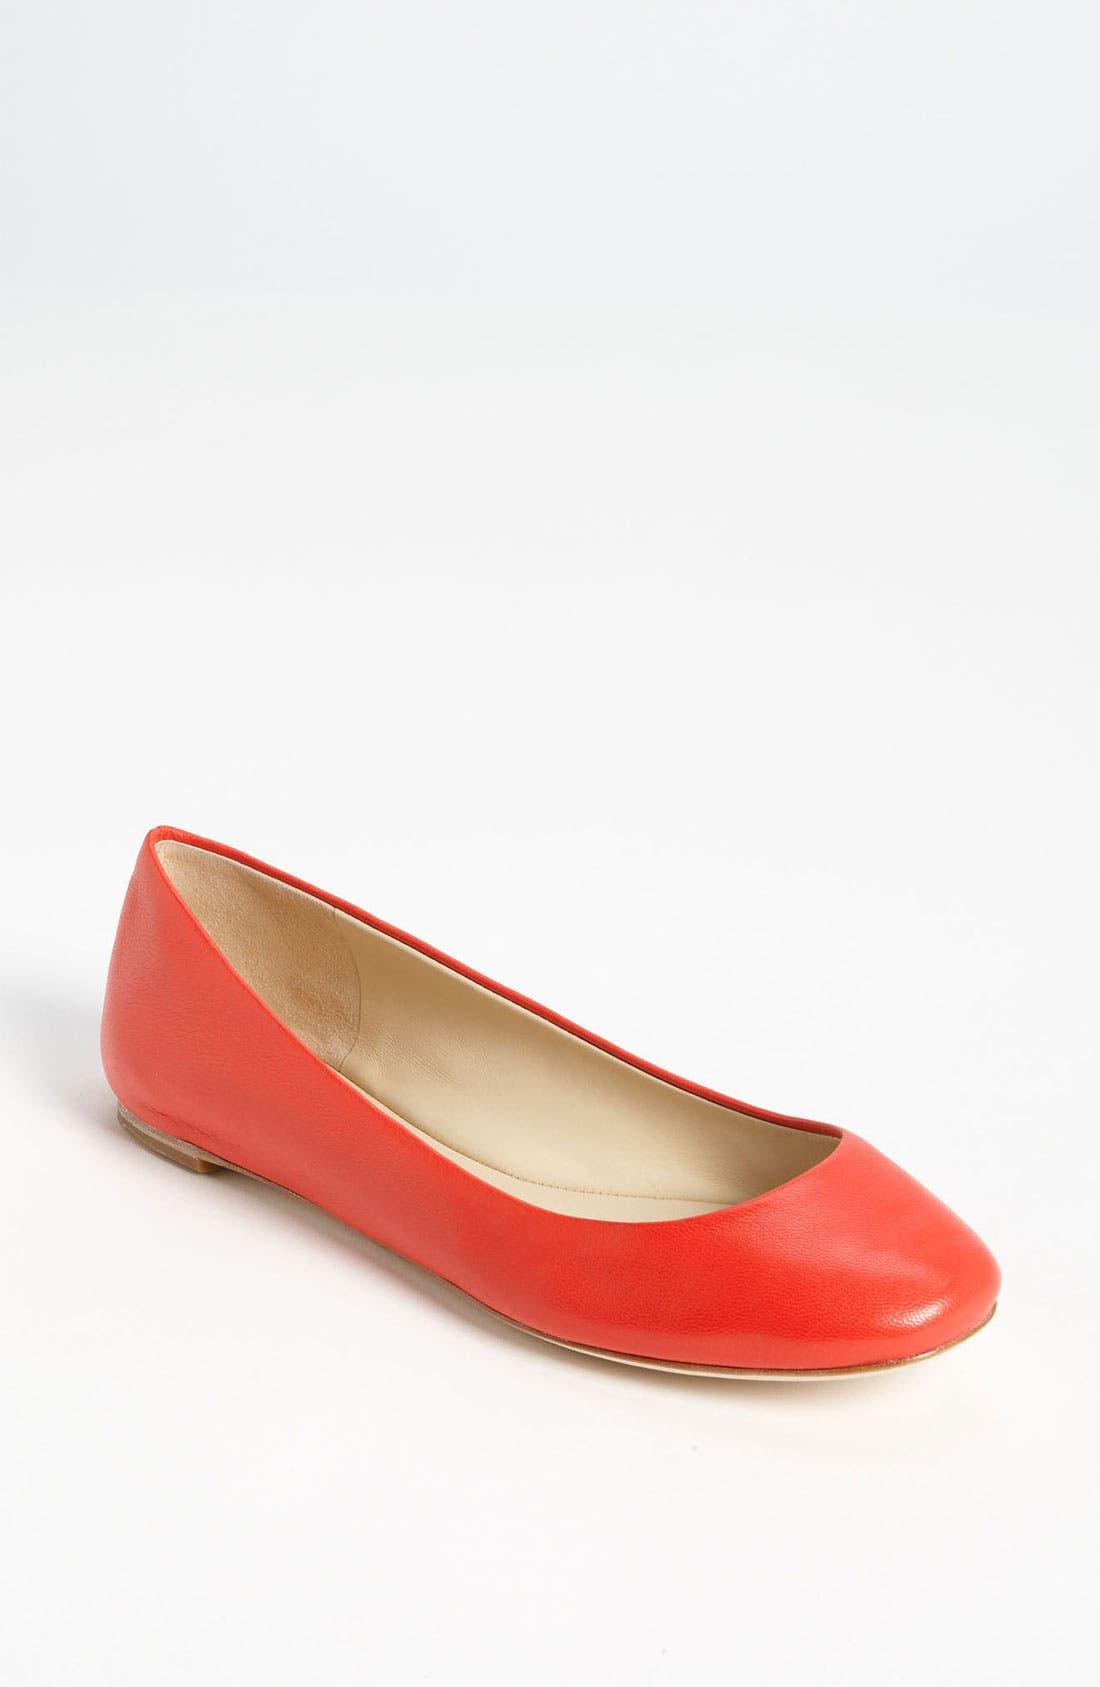 Alternate Image 1 Selected - Vera Wang Footwear 'Lara' Flat (Online Only)